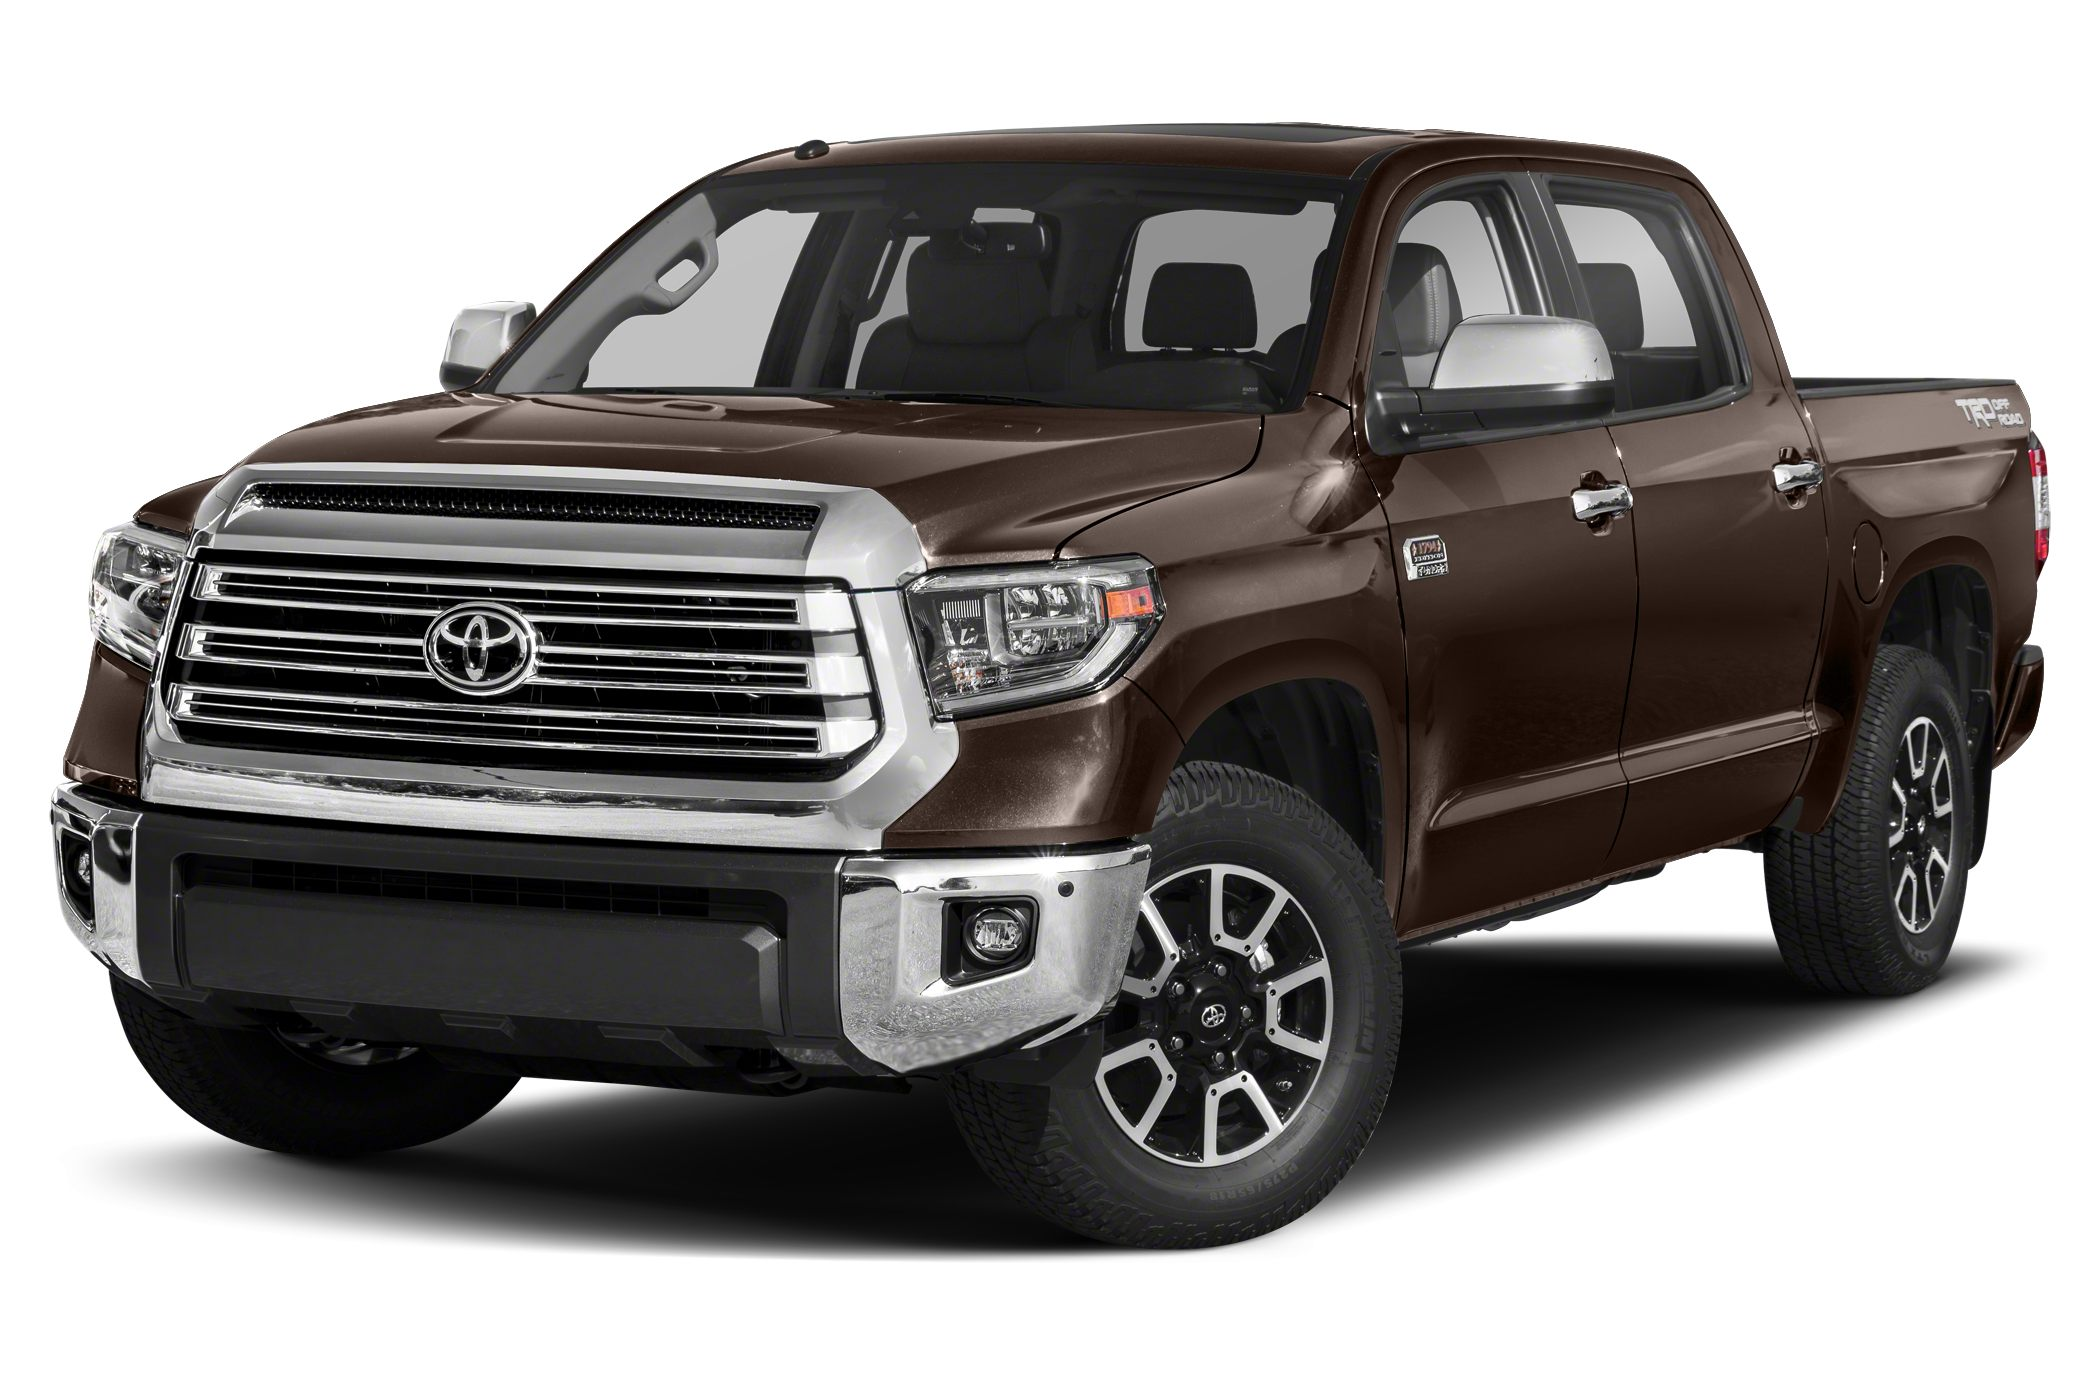 2018 Toyota Tundra 1794 5.7L V8 4x4 CrewMax 5.6 ft. box 145.7 in. WB